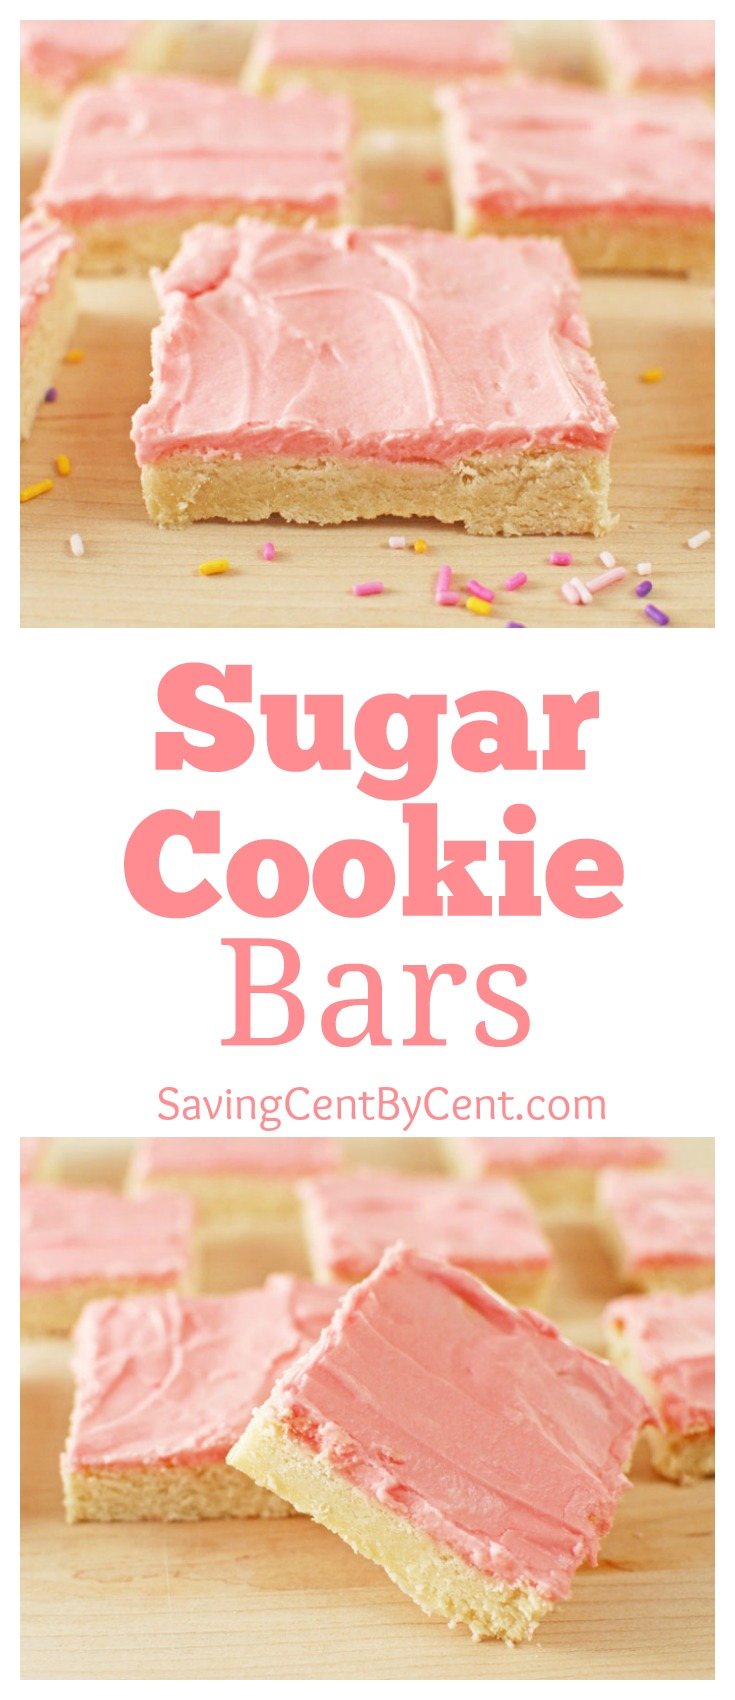 Sugar Cookie Bars on board with sprinkles